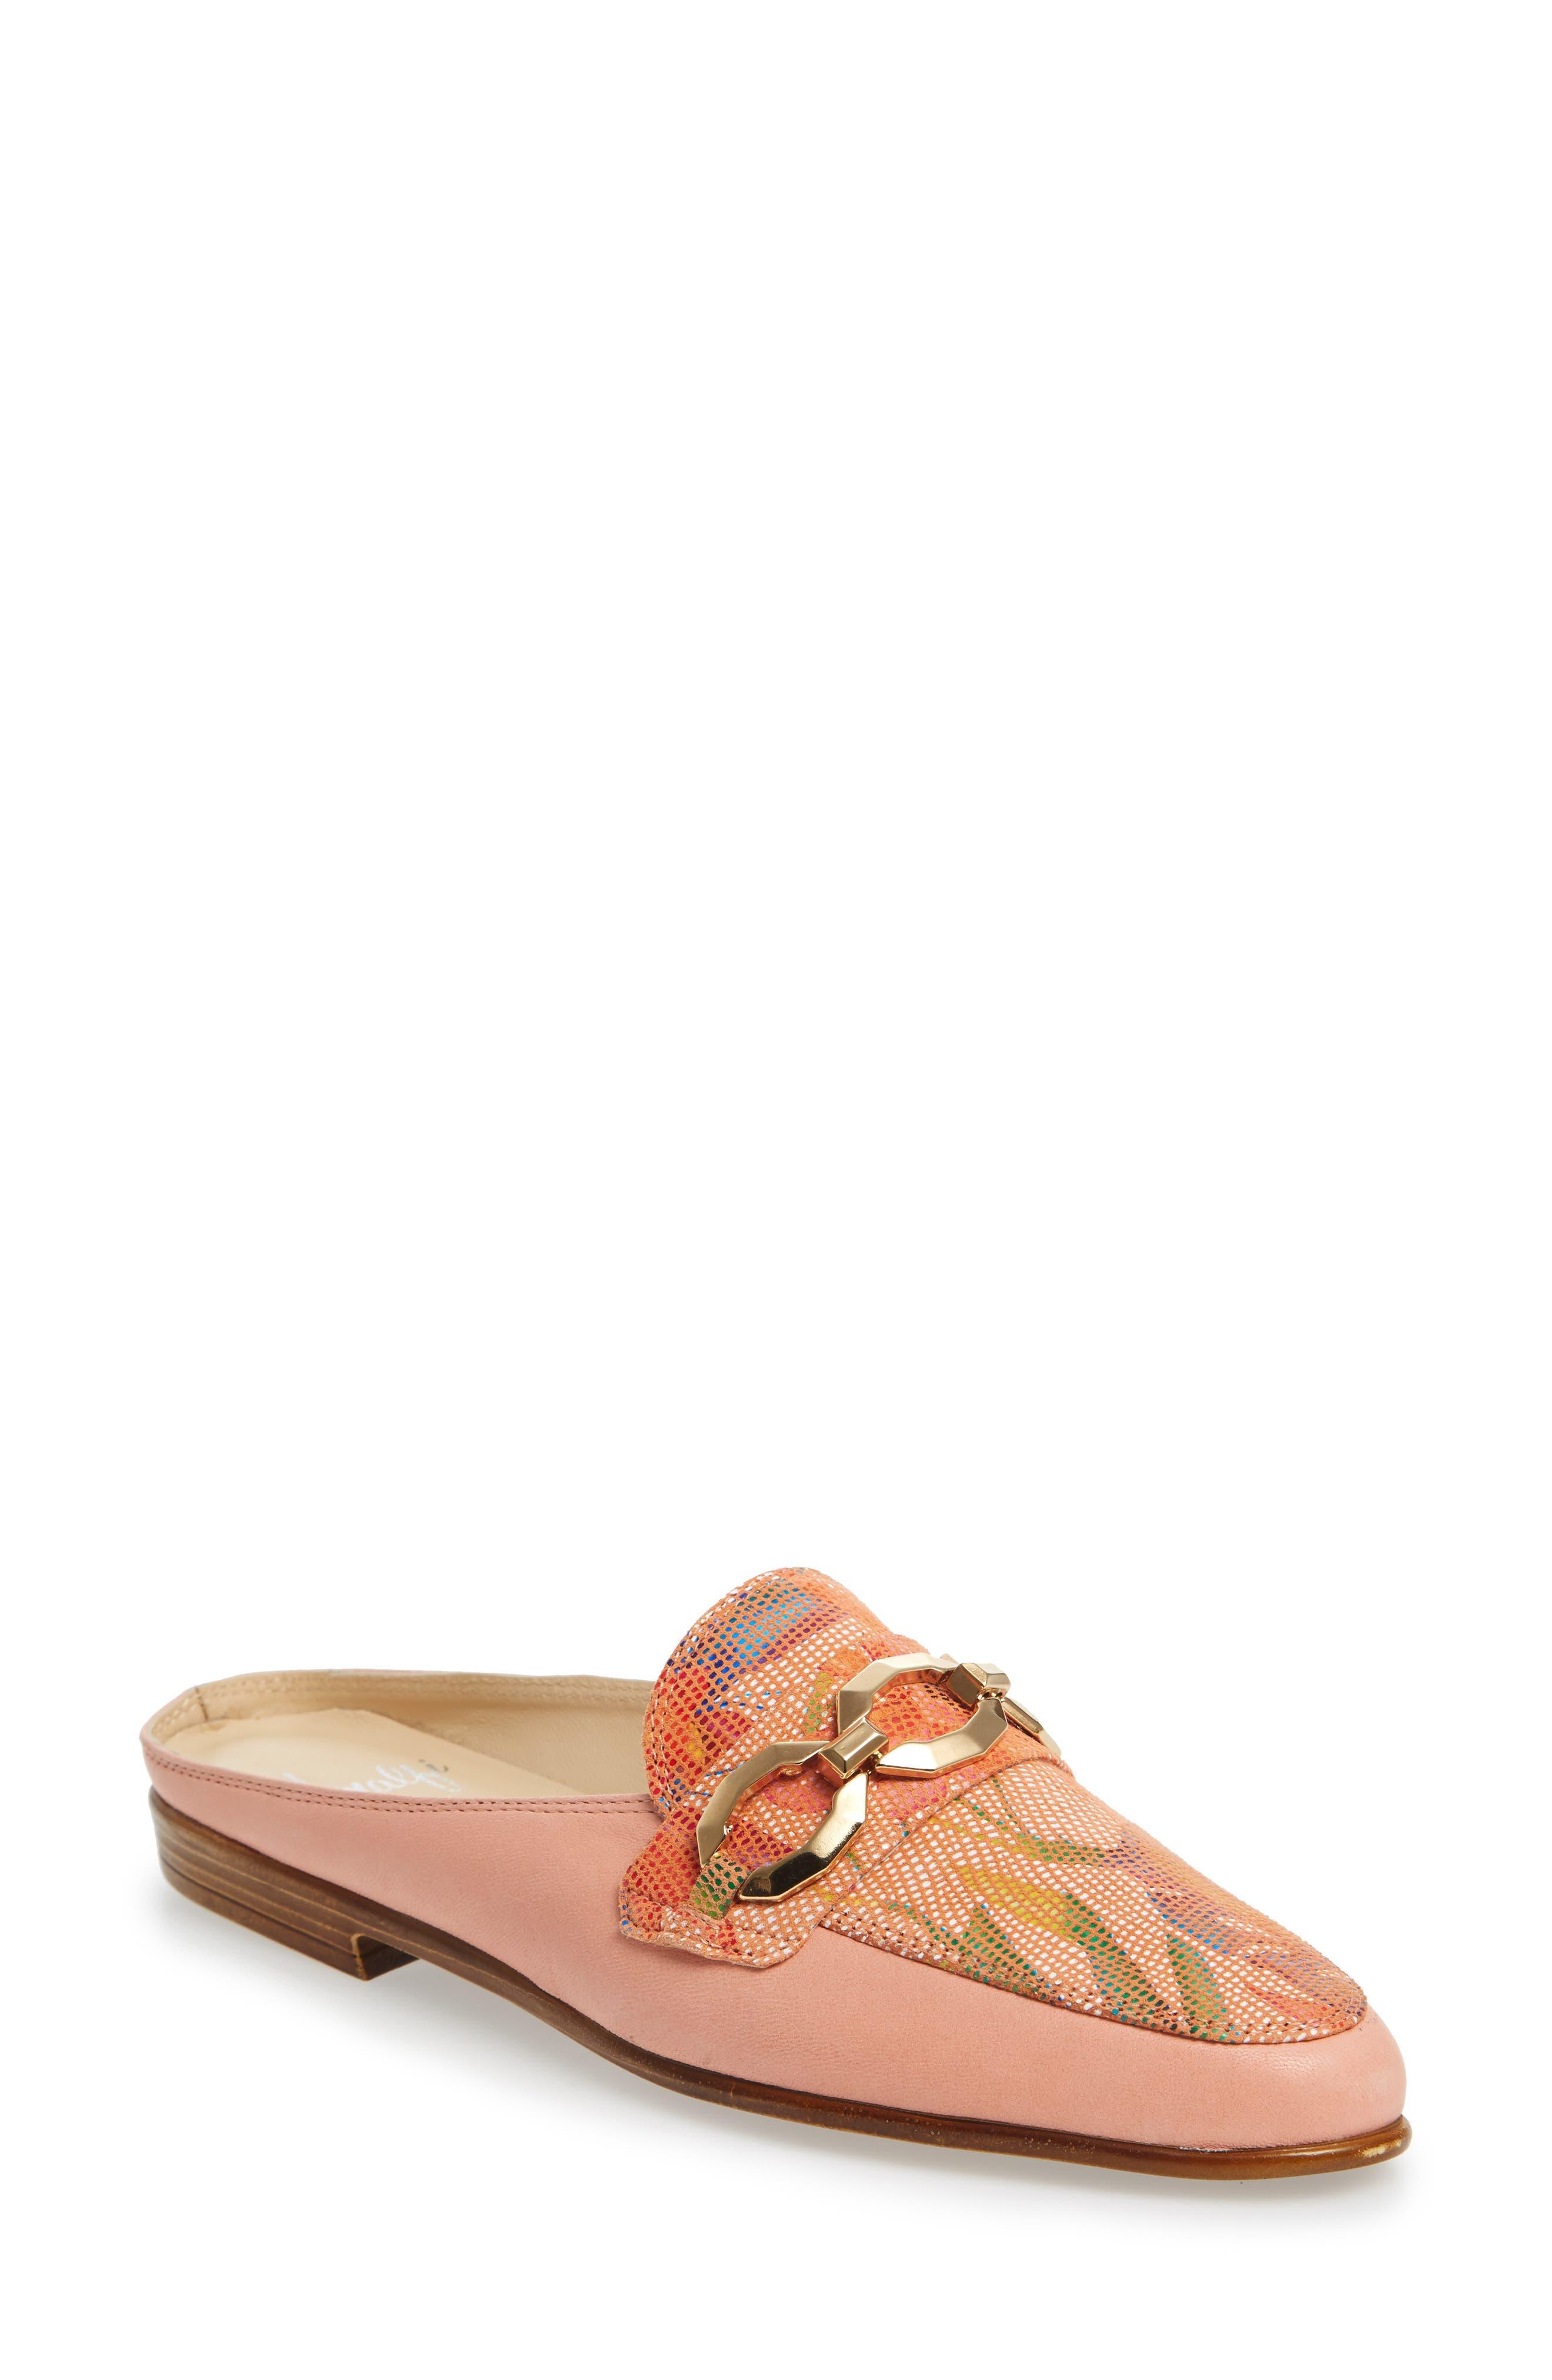 Almafi by Rangoni Otranto Loafer Slide,                             Main thumbnail 1, color,                             Rose Leather